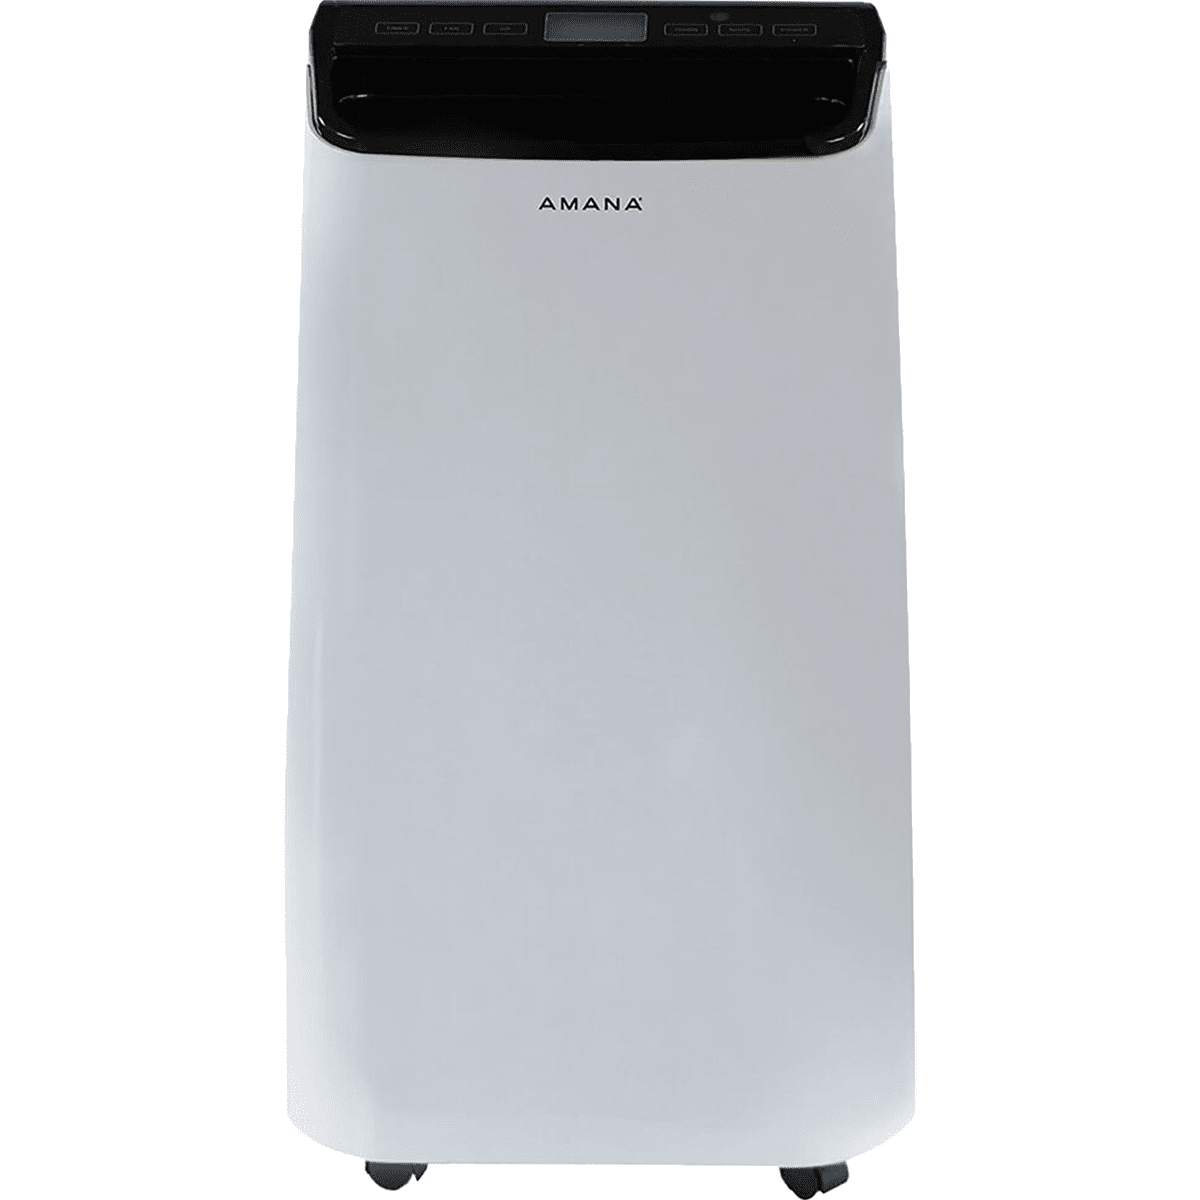 Amana 10,000 BTU Portable Air Conditioner-White/Black